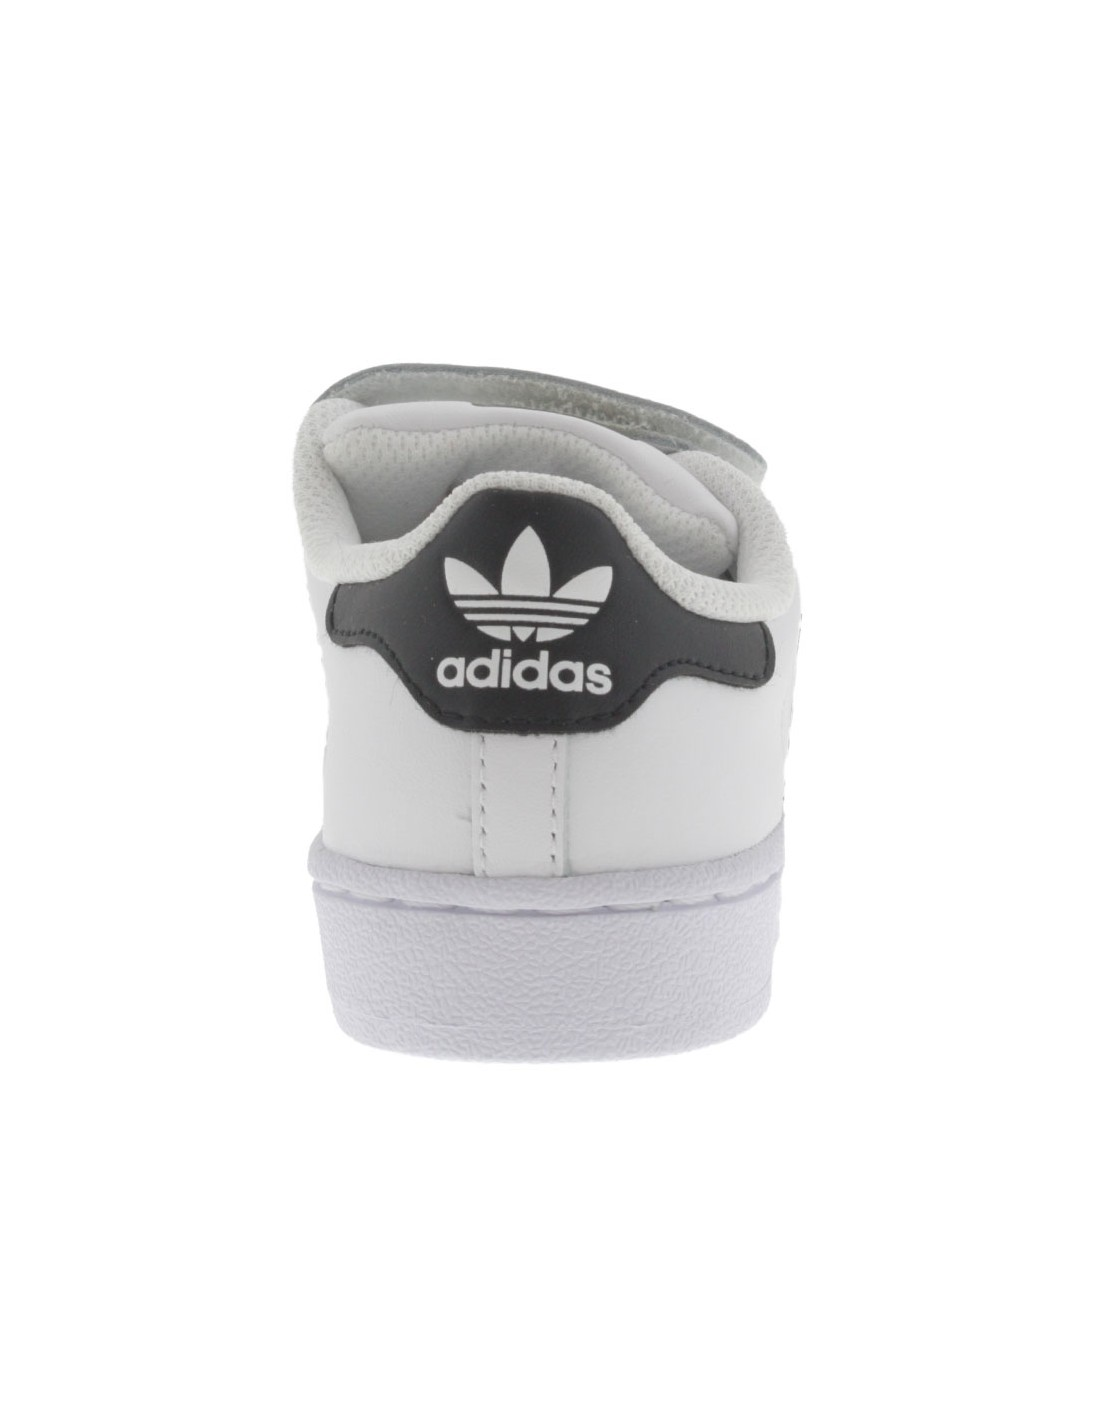 scarpe adidas bambino 6 anni